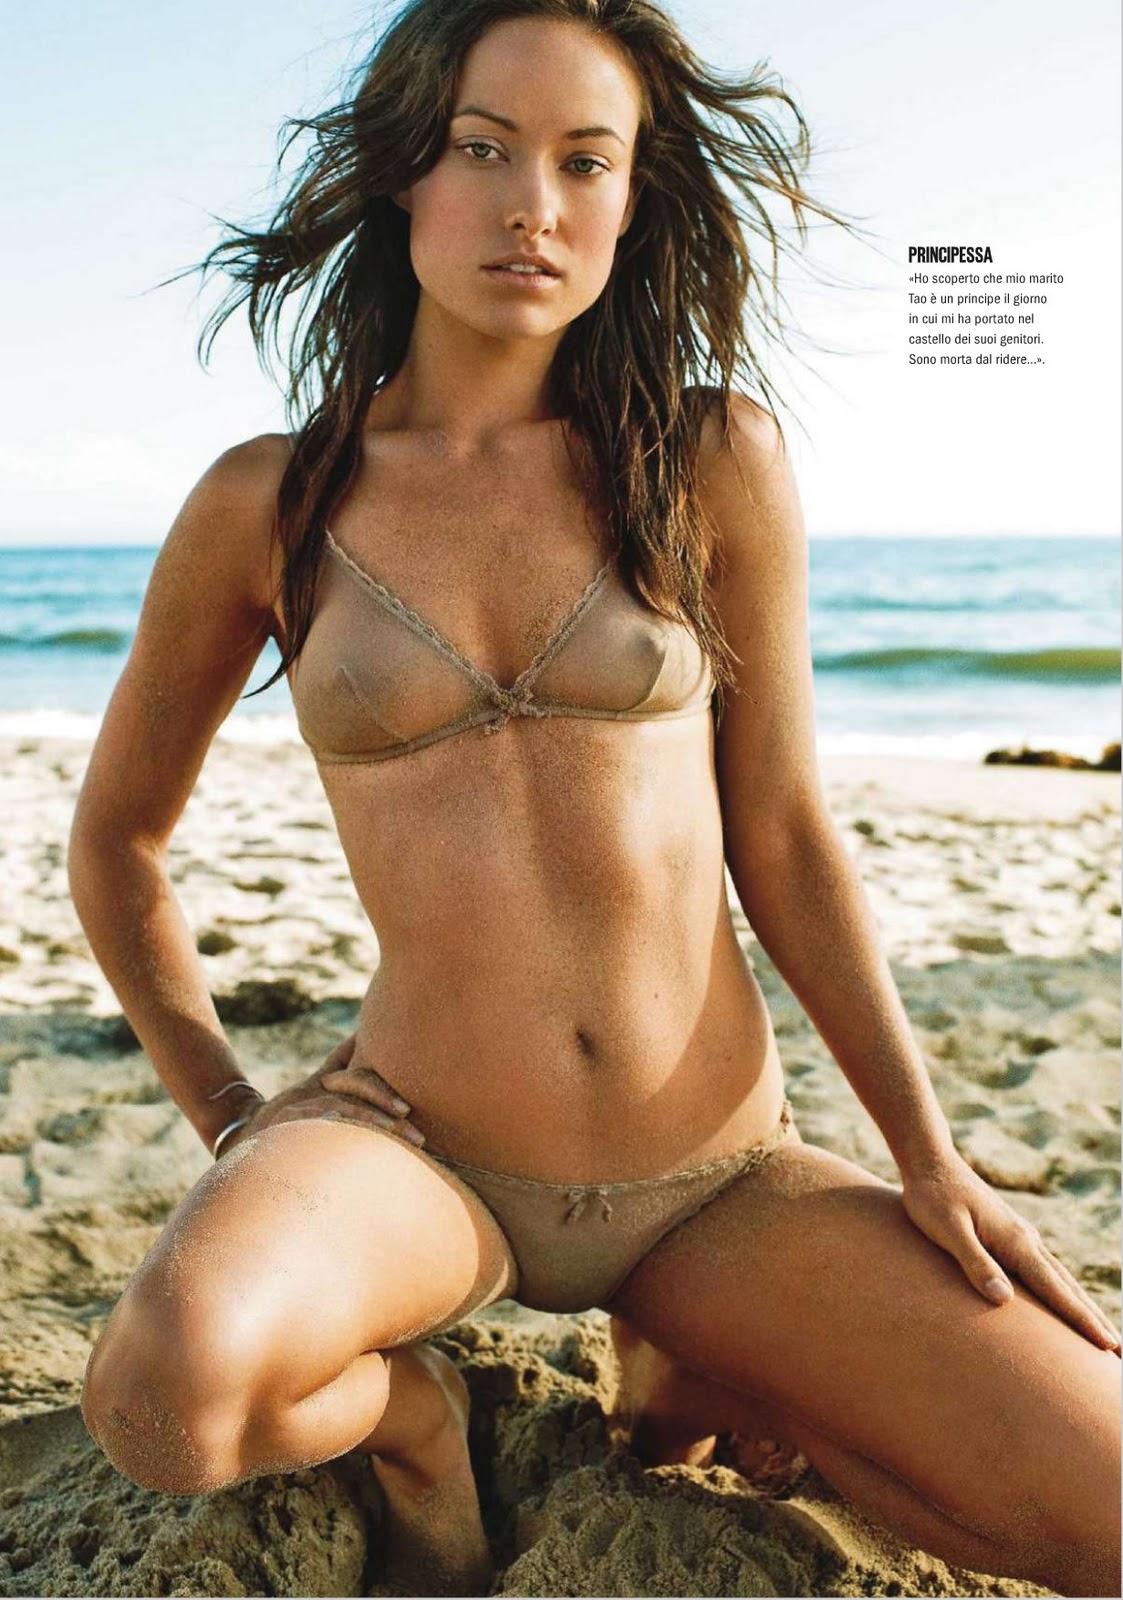 http://1.bp.blogspot.com/_QcYf_8sBCik/TSV3VqUMsrI/AAAAAAAAH6U/vIN0UXUtVlA/s1600/Olivia+Wilde+%25E2%2580%2593+Max+Magazine+%25287%2529.jpg